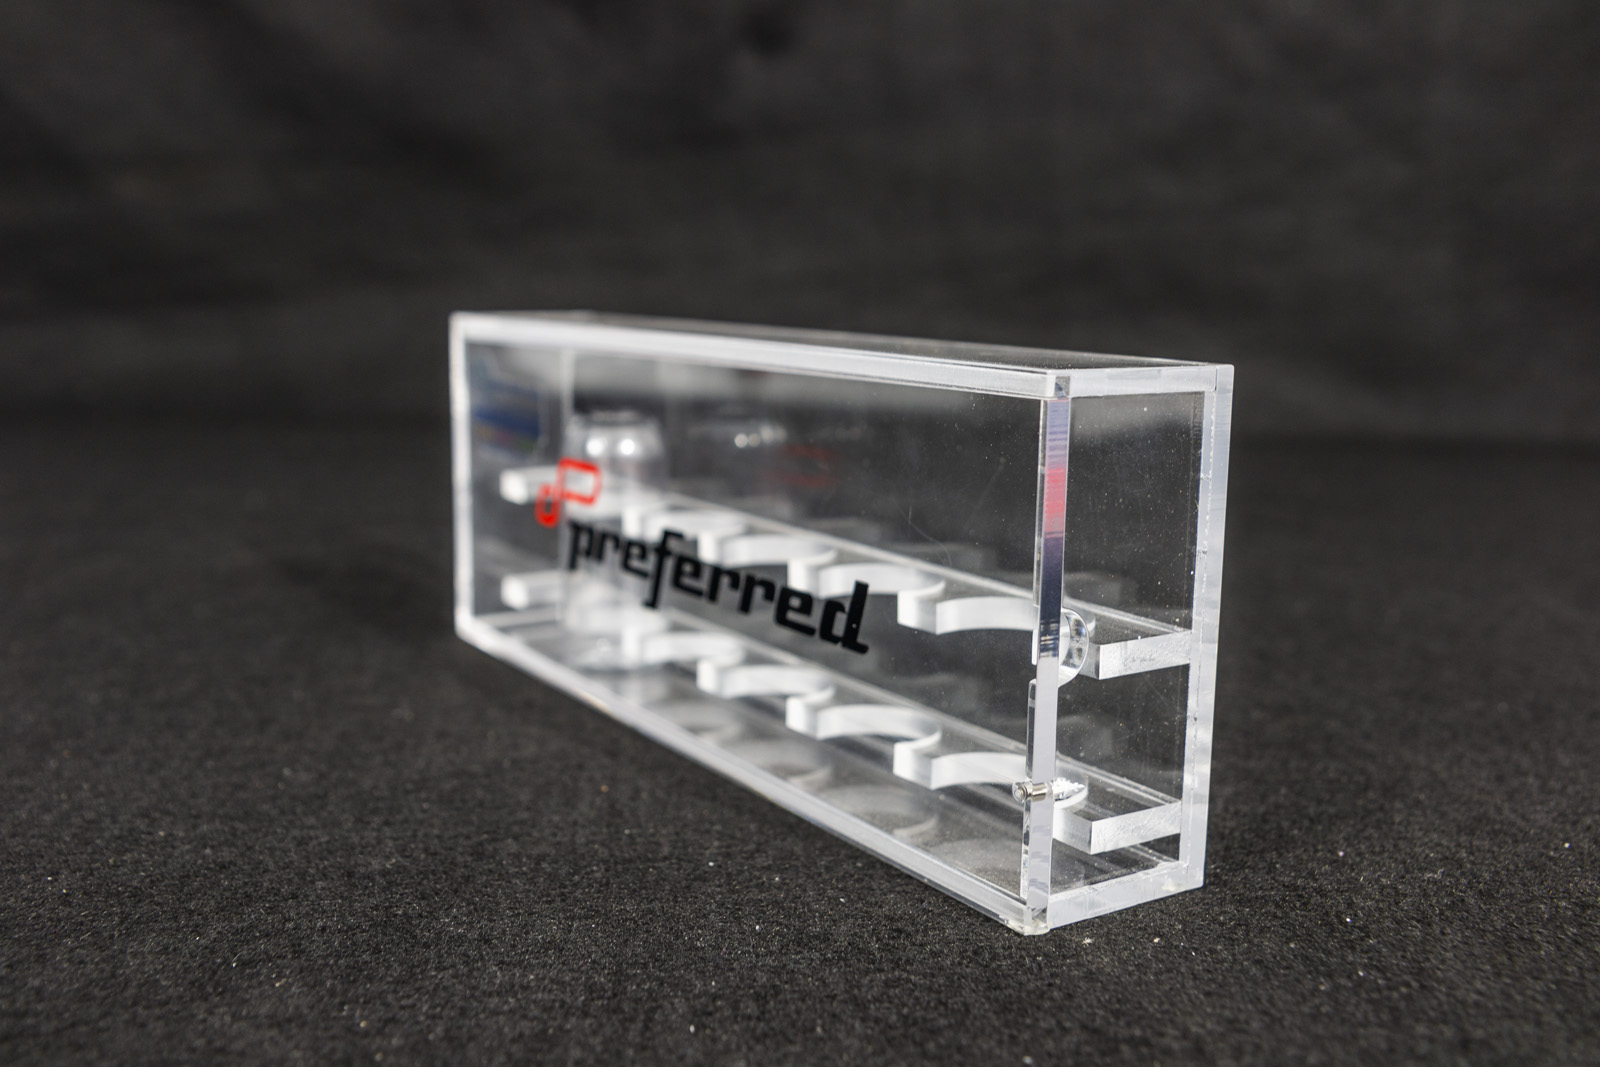 Preferred_Case_Display